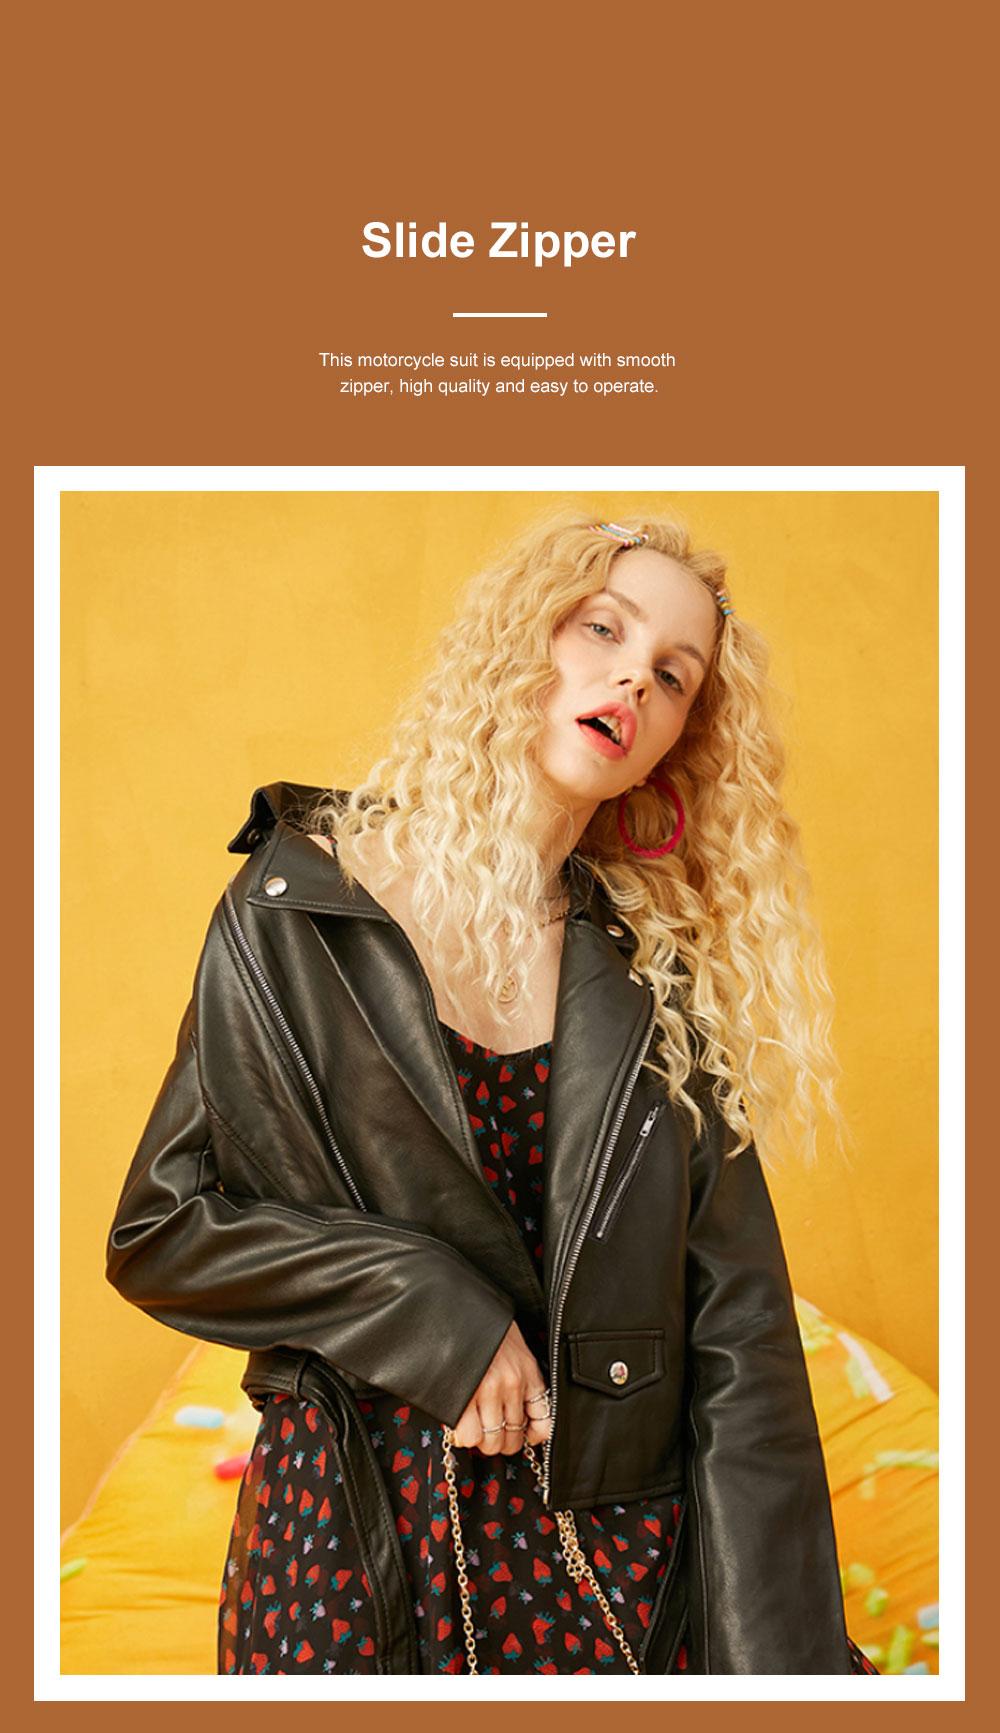 ELFSACK Short Locomotive Suit New Retro Loose Black PU Leather Top in Autumn 2019 Girls' Top Coat 2